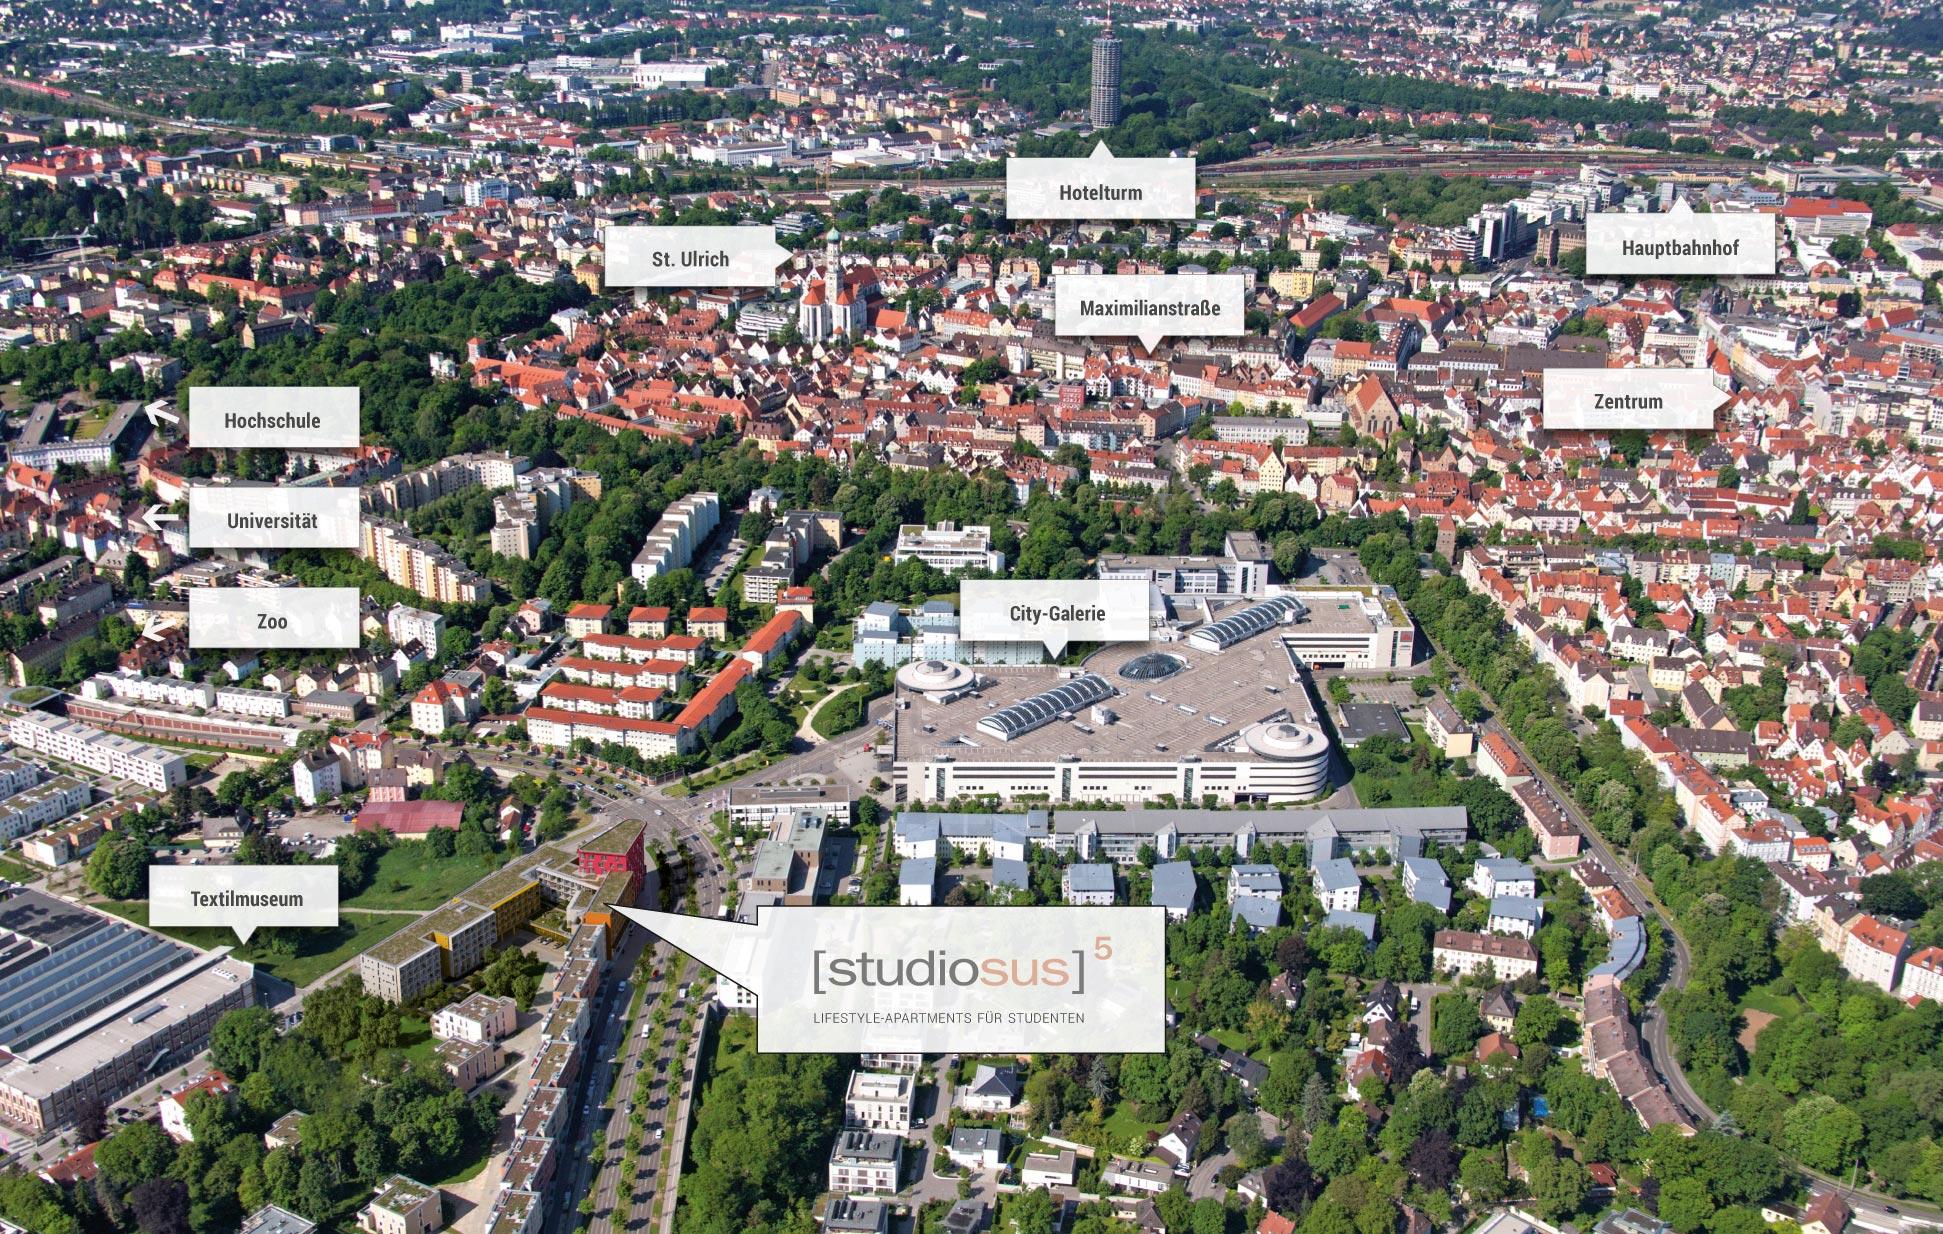 Studiosus 5 Studentenwohnungen Amp Apartments In Augsburg